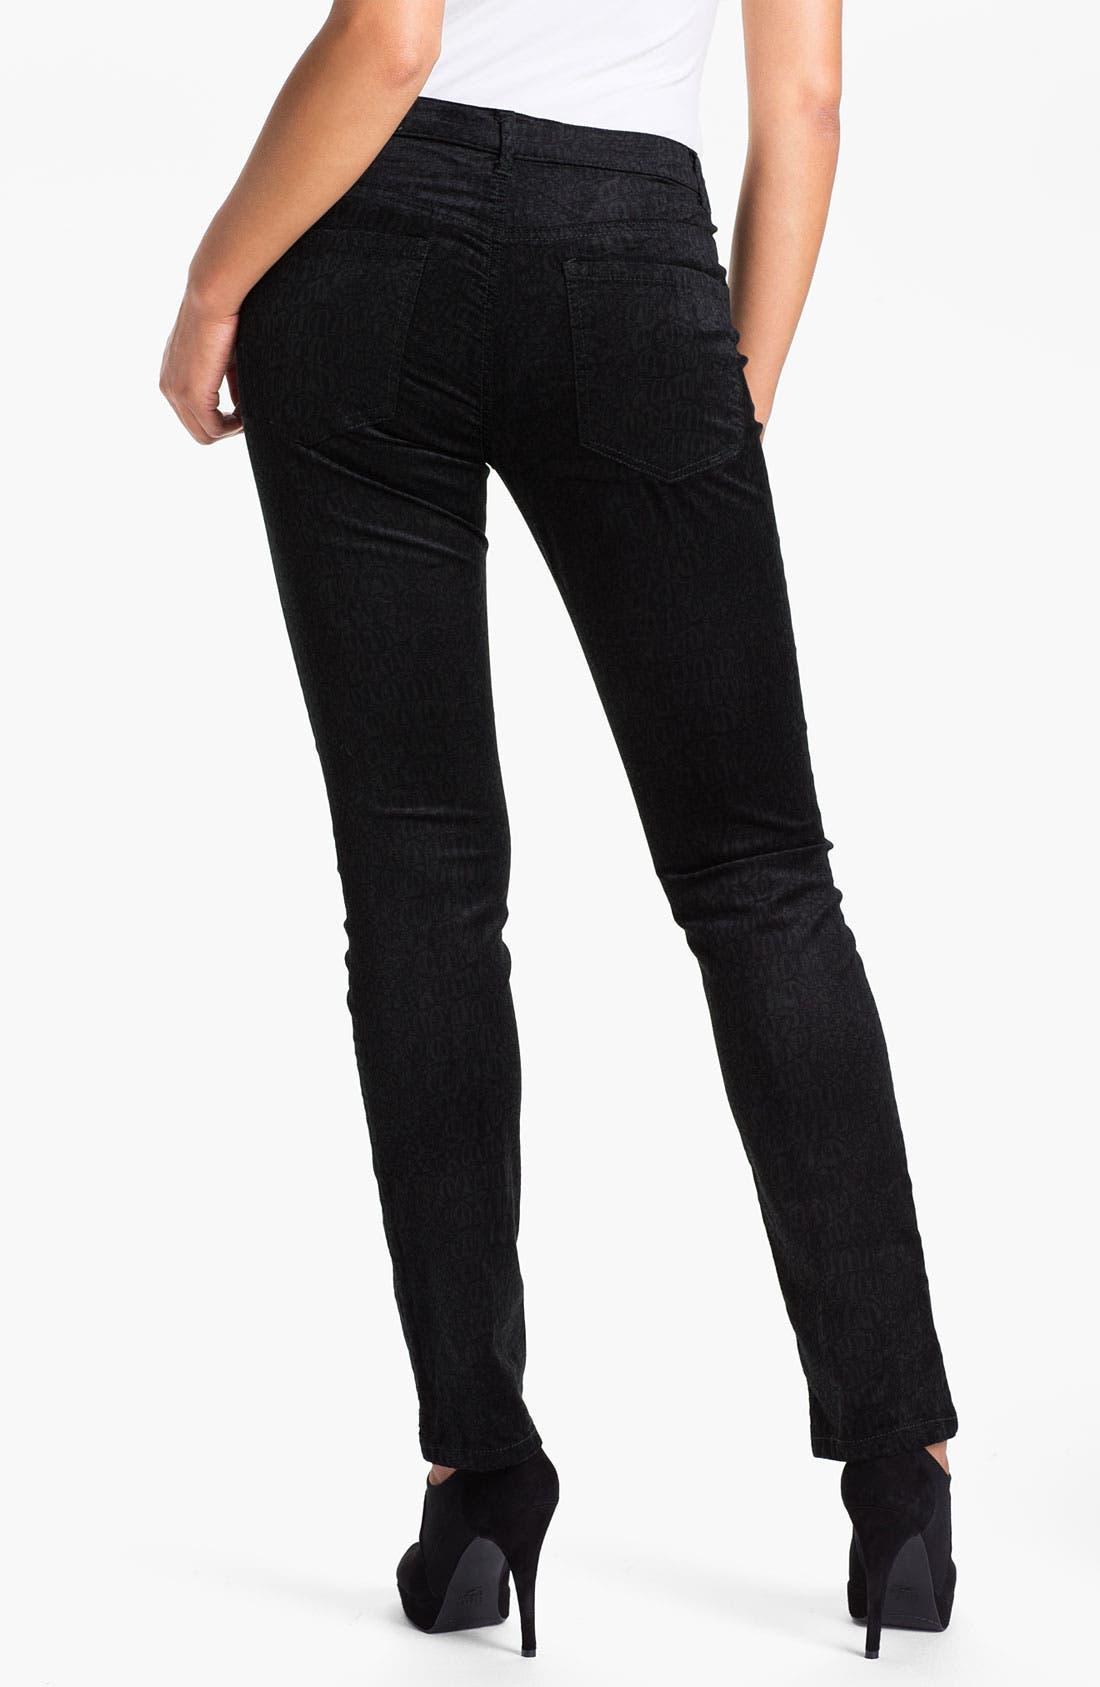 Alternate Image 2  - Liverpool Jeans Company 'Sadie' - Cheetah' Straight Leg Velveteen Jeans